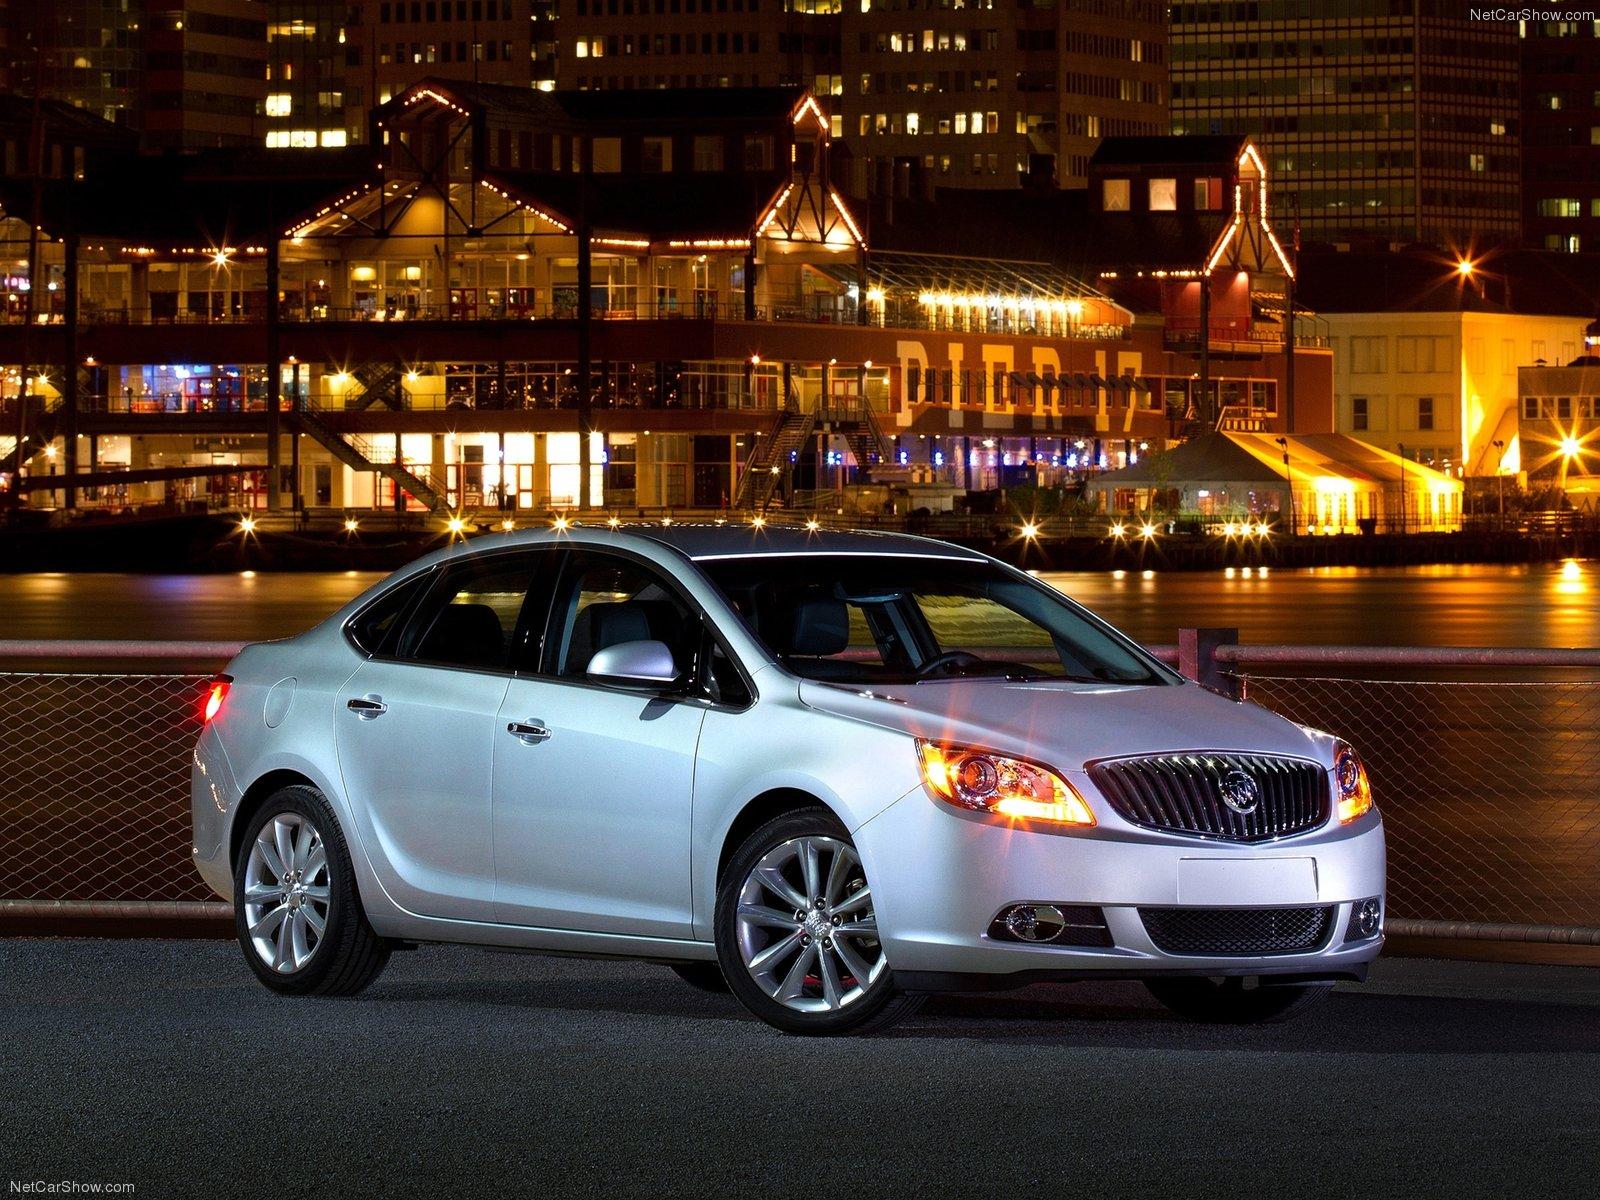 specs photos autotrader trims options research reviews ca verano buick price